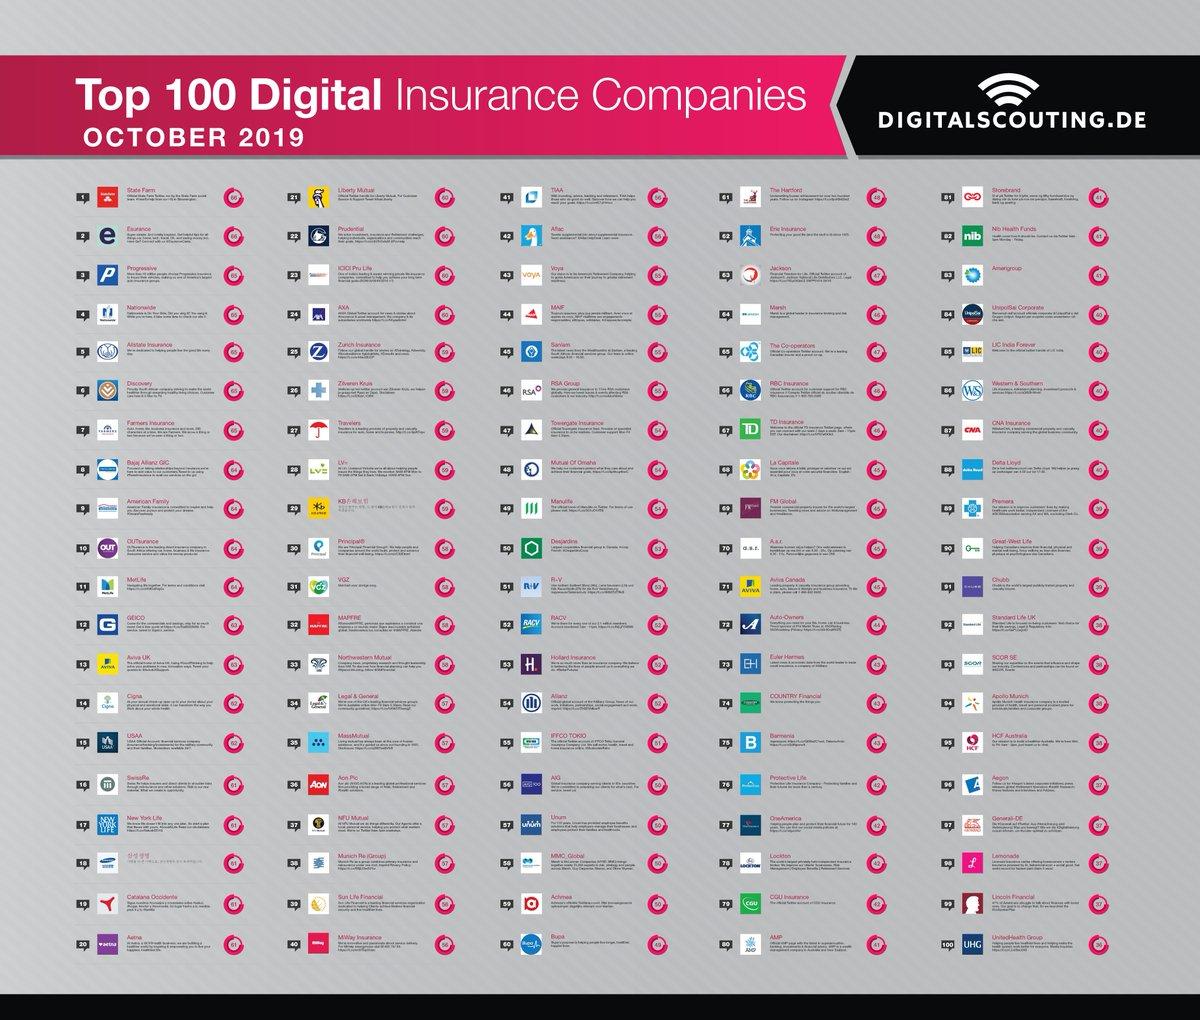 Digitalscoutings Top 100 digital #insurance companies ranking is there.  http:// snip.ly/8lu3gg      Congrats to:  @tiaa @aflac @voya @maif @sanlam @rsagroup @towergate @mutualofomaha @manulife @desjardinsgroup   #insurtech #fintech #AI Team<br>http://pic.twitter.com/hnL119z62c